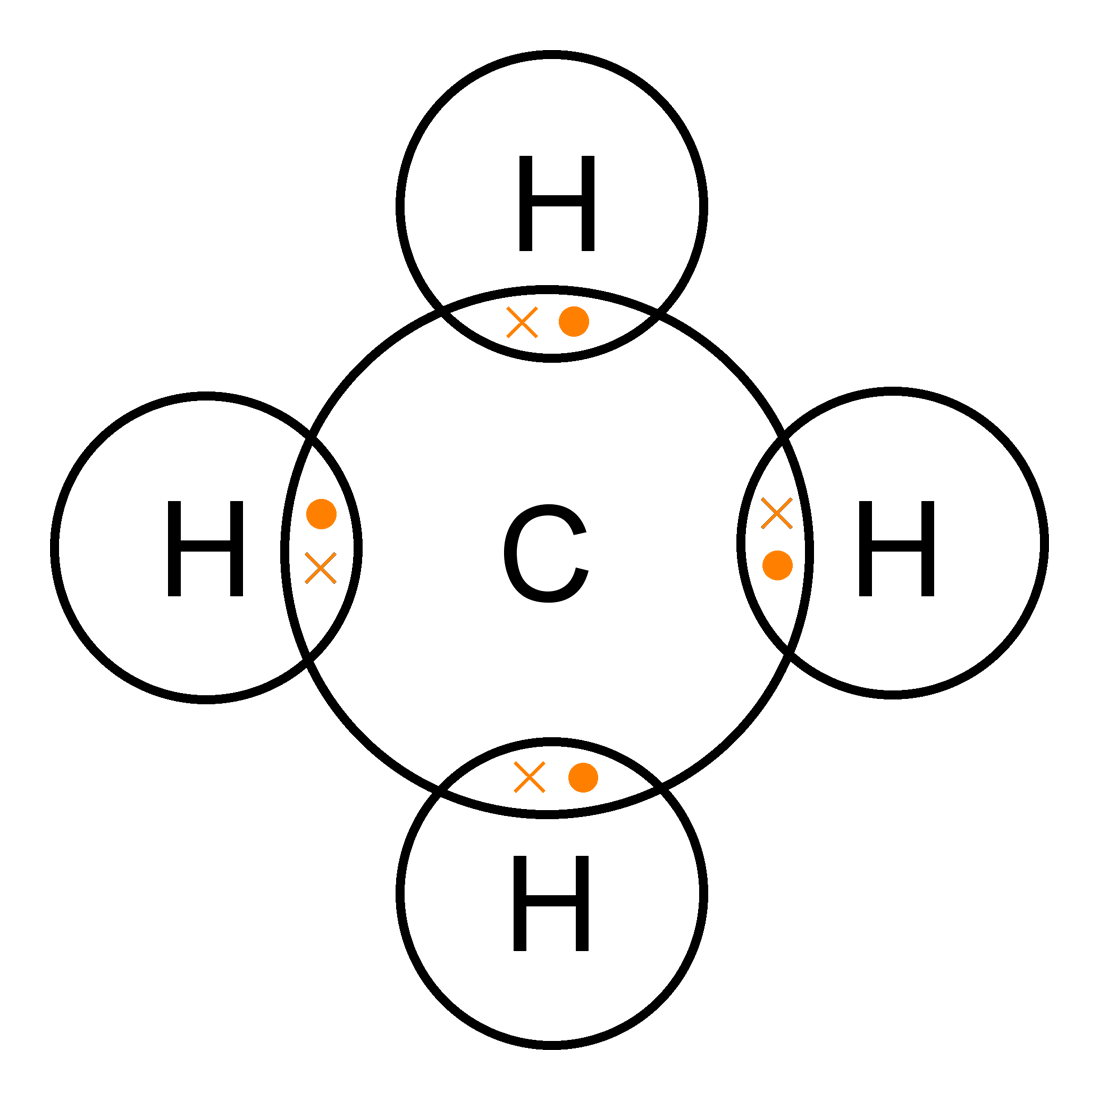 file methane 2d dot cross png wikimedia commons : methane diagram - findchart.co